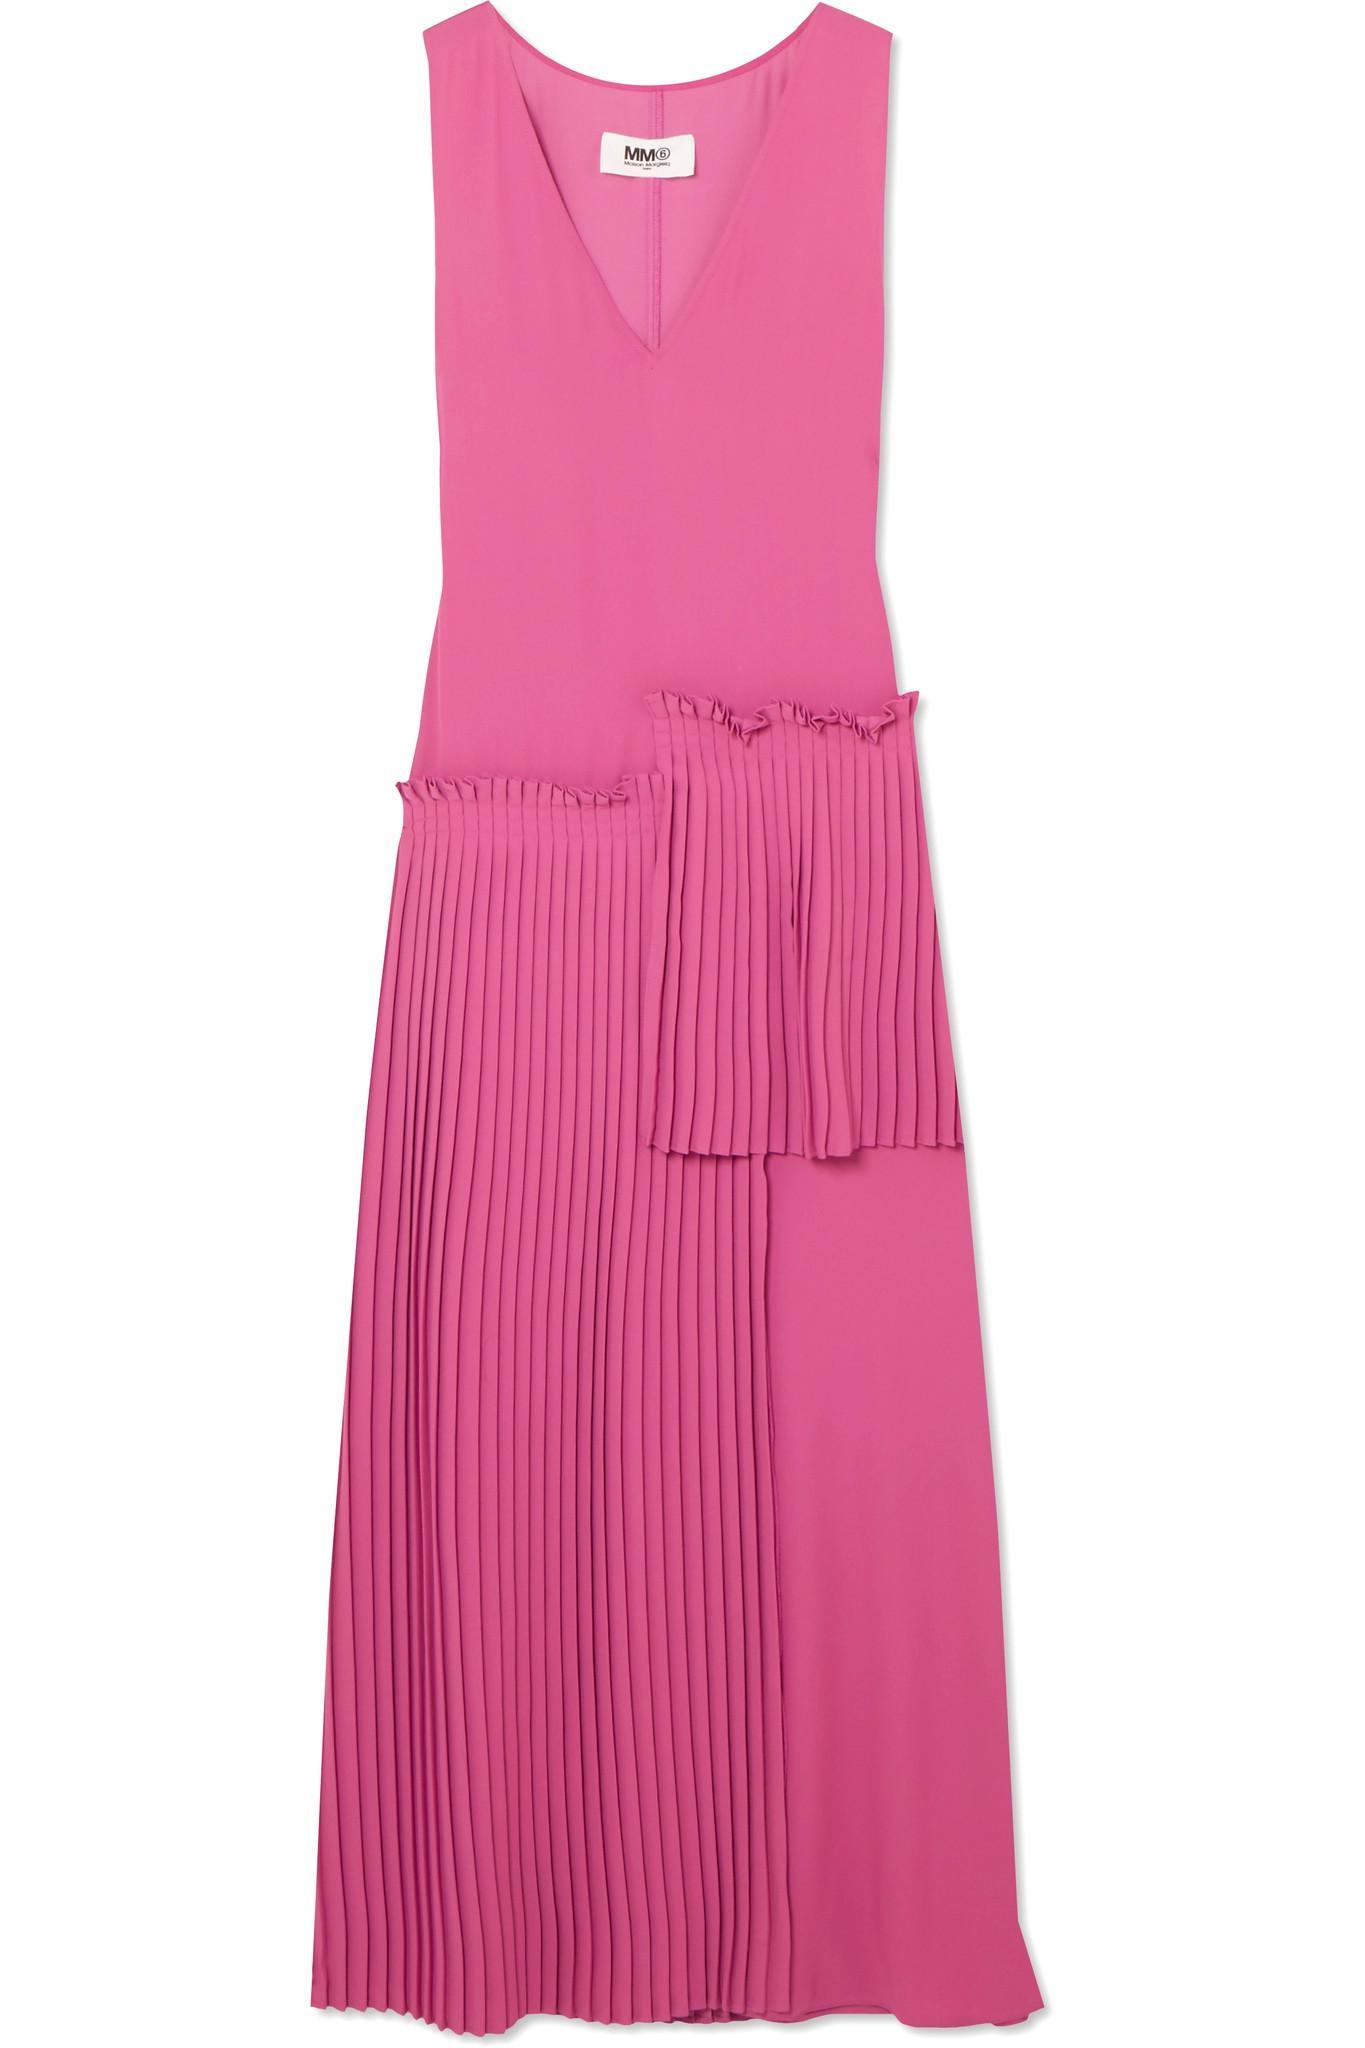 Crepe Dress Maison Martin Margiela Sale Wiki Cheap Price Wholesale Price Free Shipping Looking For SB7Ewak